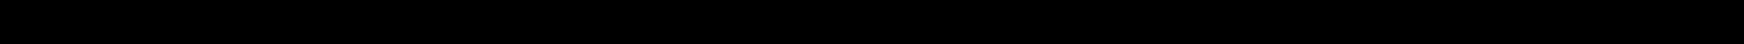 IsonormMonospacedPro-Italic.otf